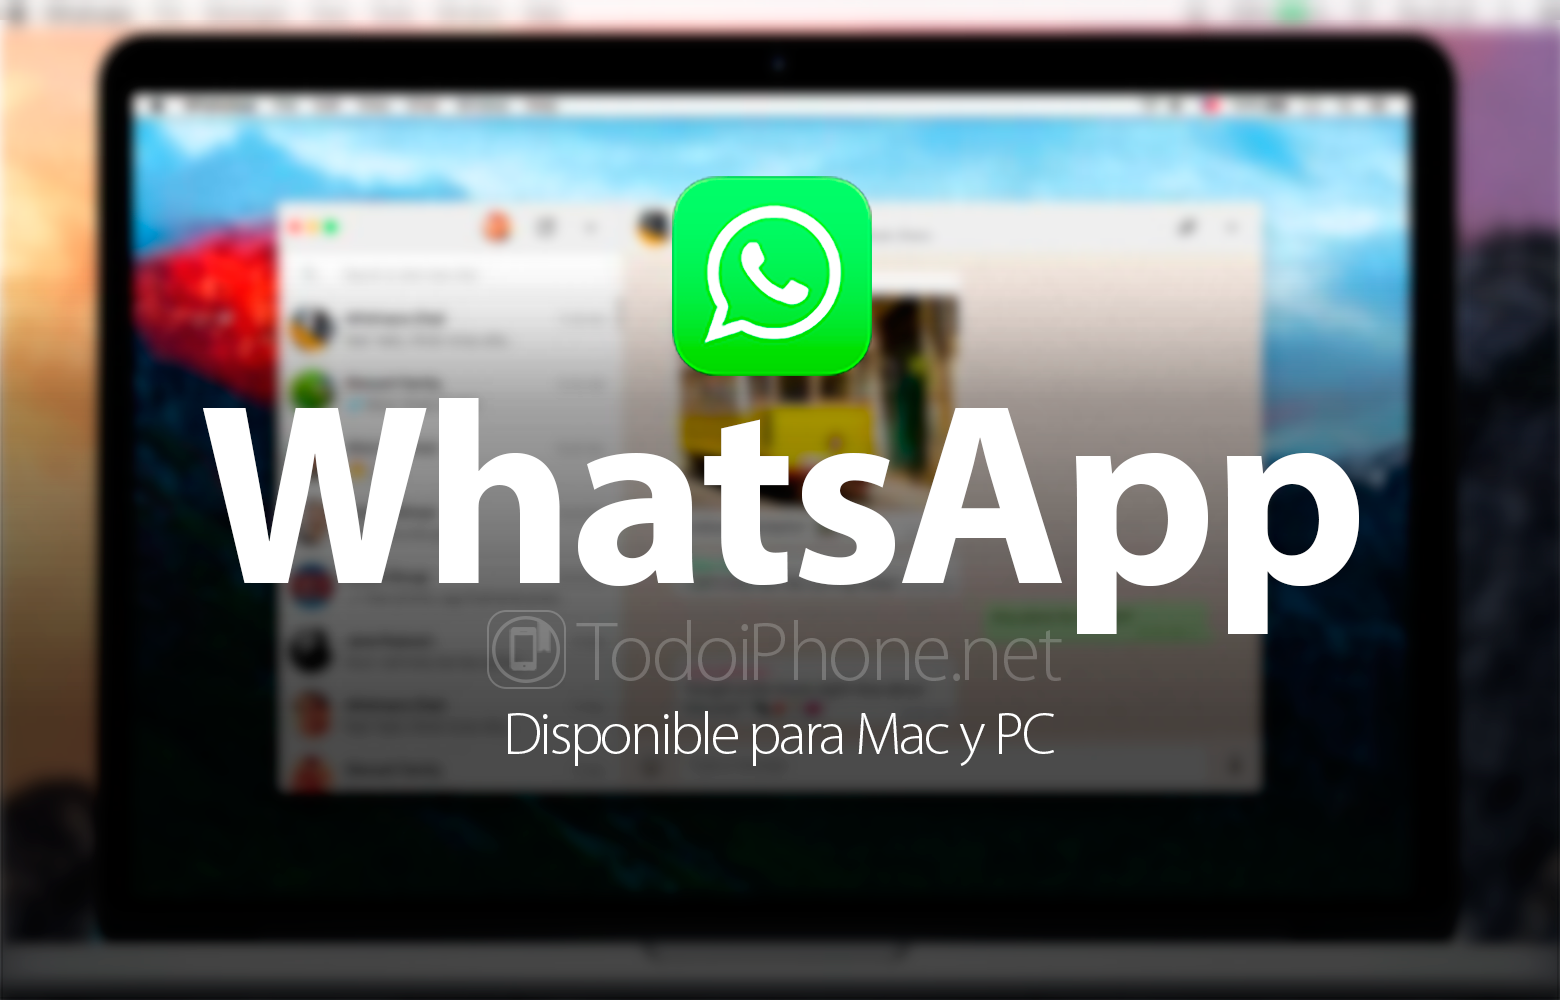 whatsapp-mac-pc-disponible-enlaces